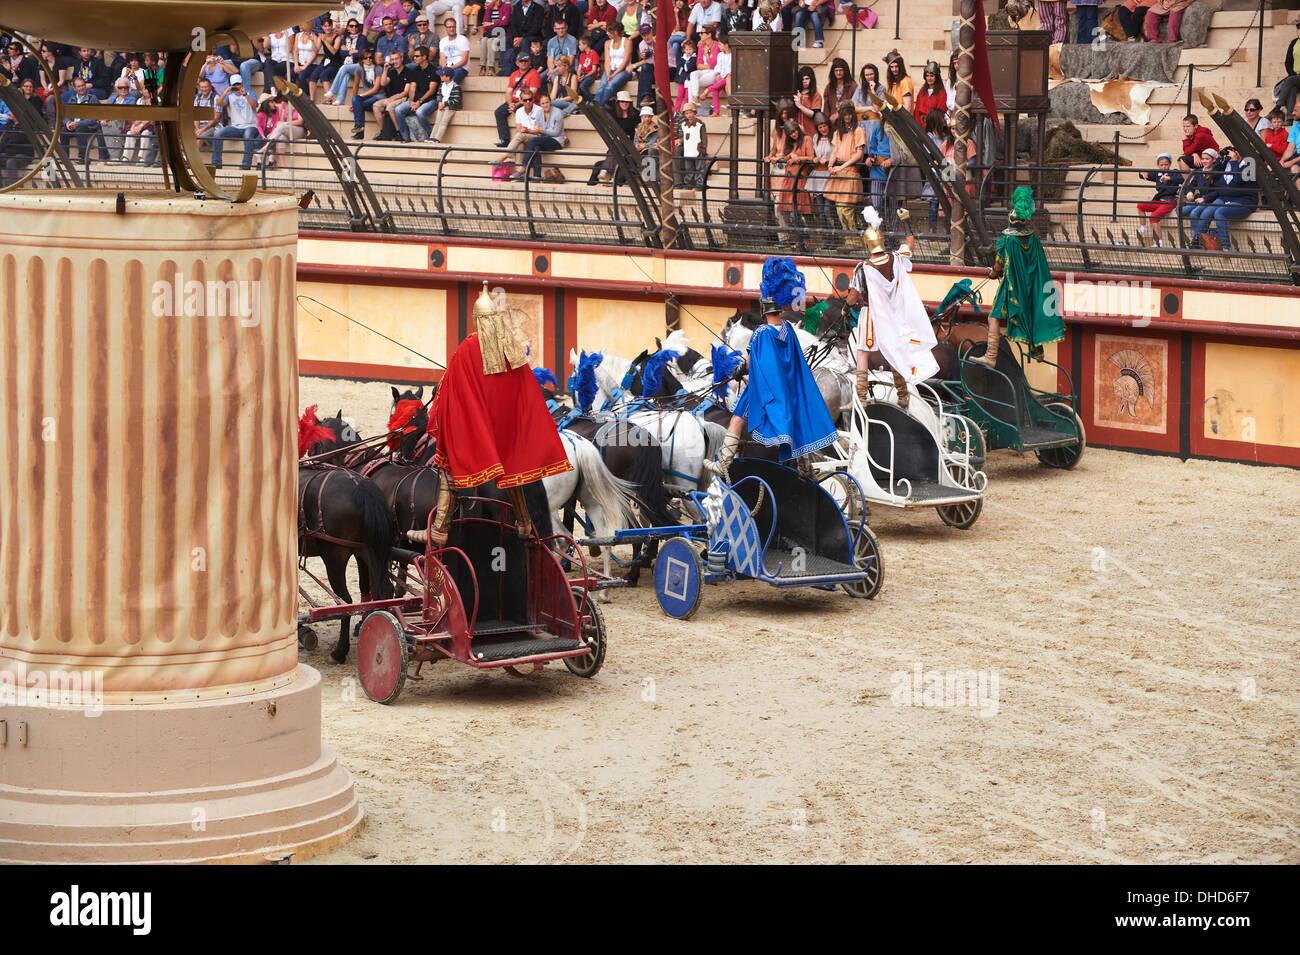 Roman Chariot Race Stockfotos Bilder Alamy Selis Electric Wheel Chair Rmisches Wagenrennen In Puy Du Fou Frankreich Stockbild